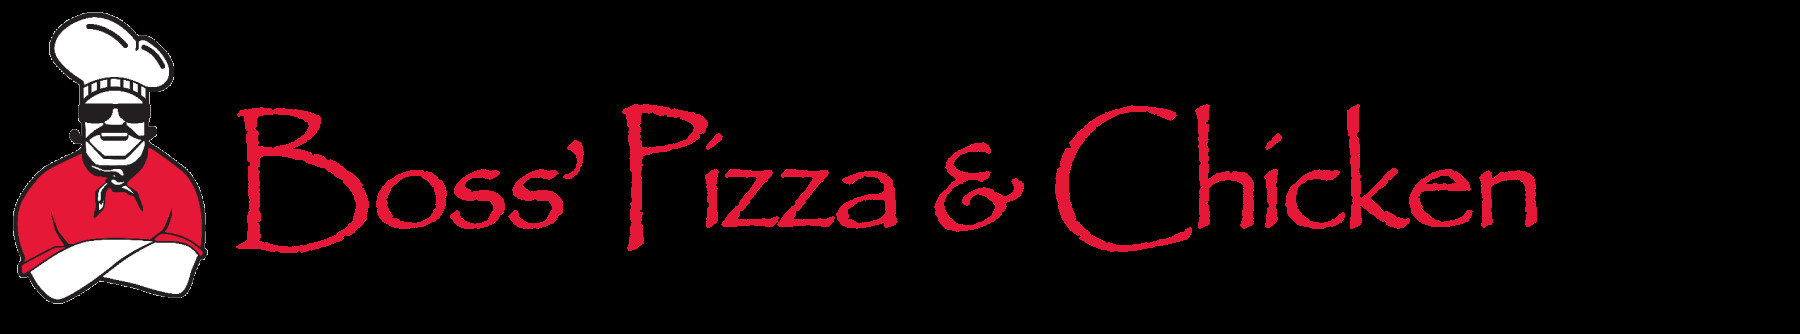 Boss Pizza And Chicken Sioux Falls  Boss Pizza & Chicken Restaurant in SD NE & MN